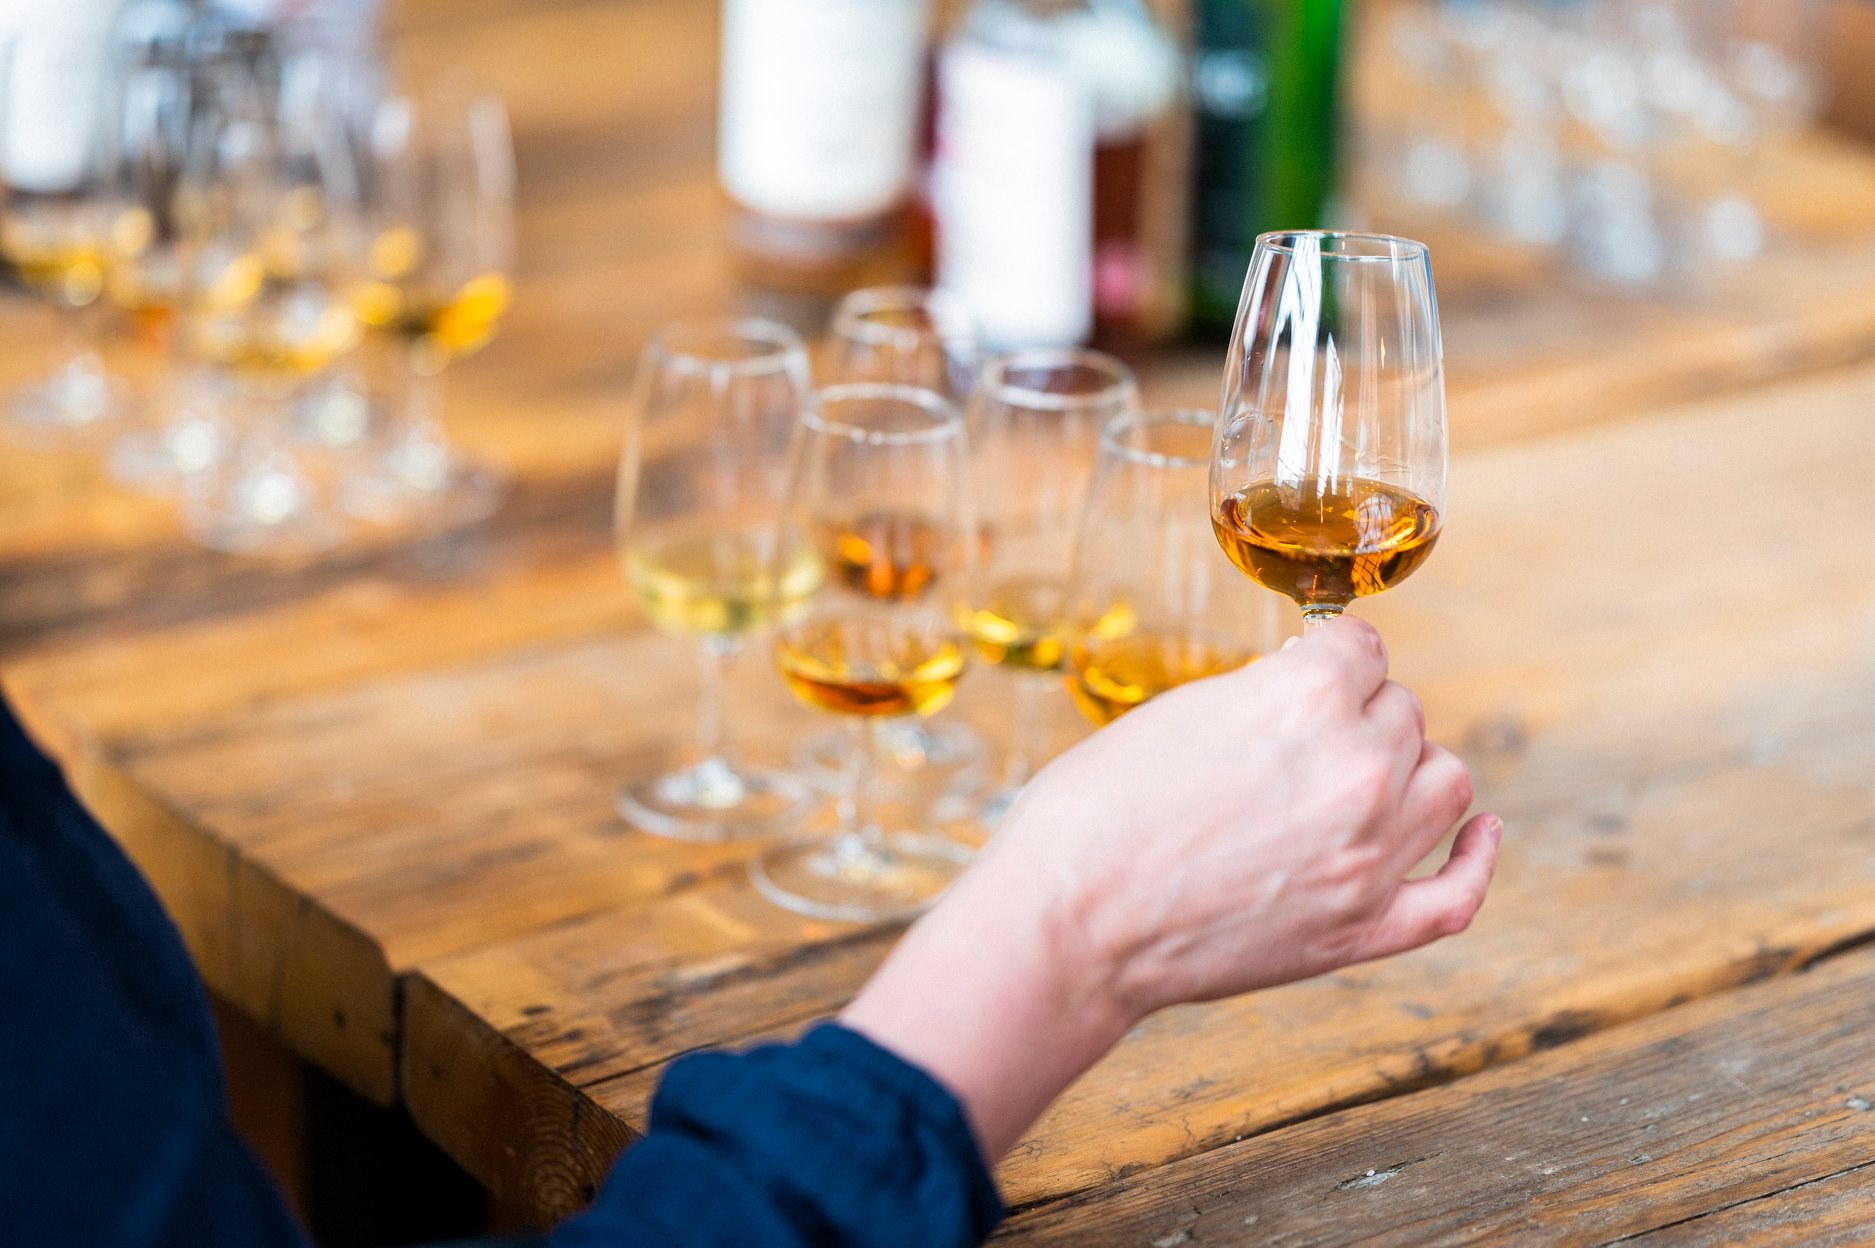 The Birmingham Whisky Club